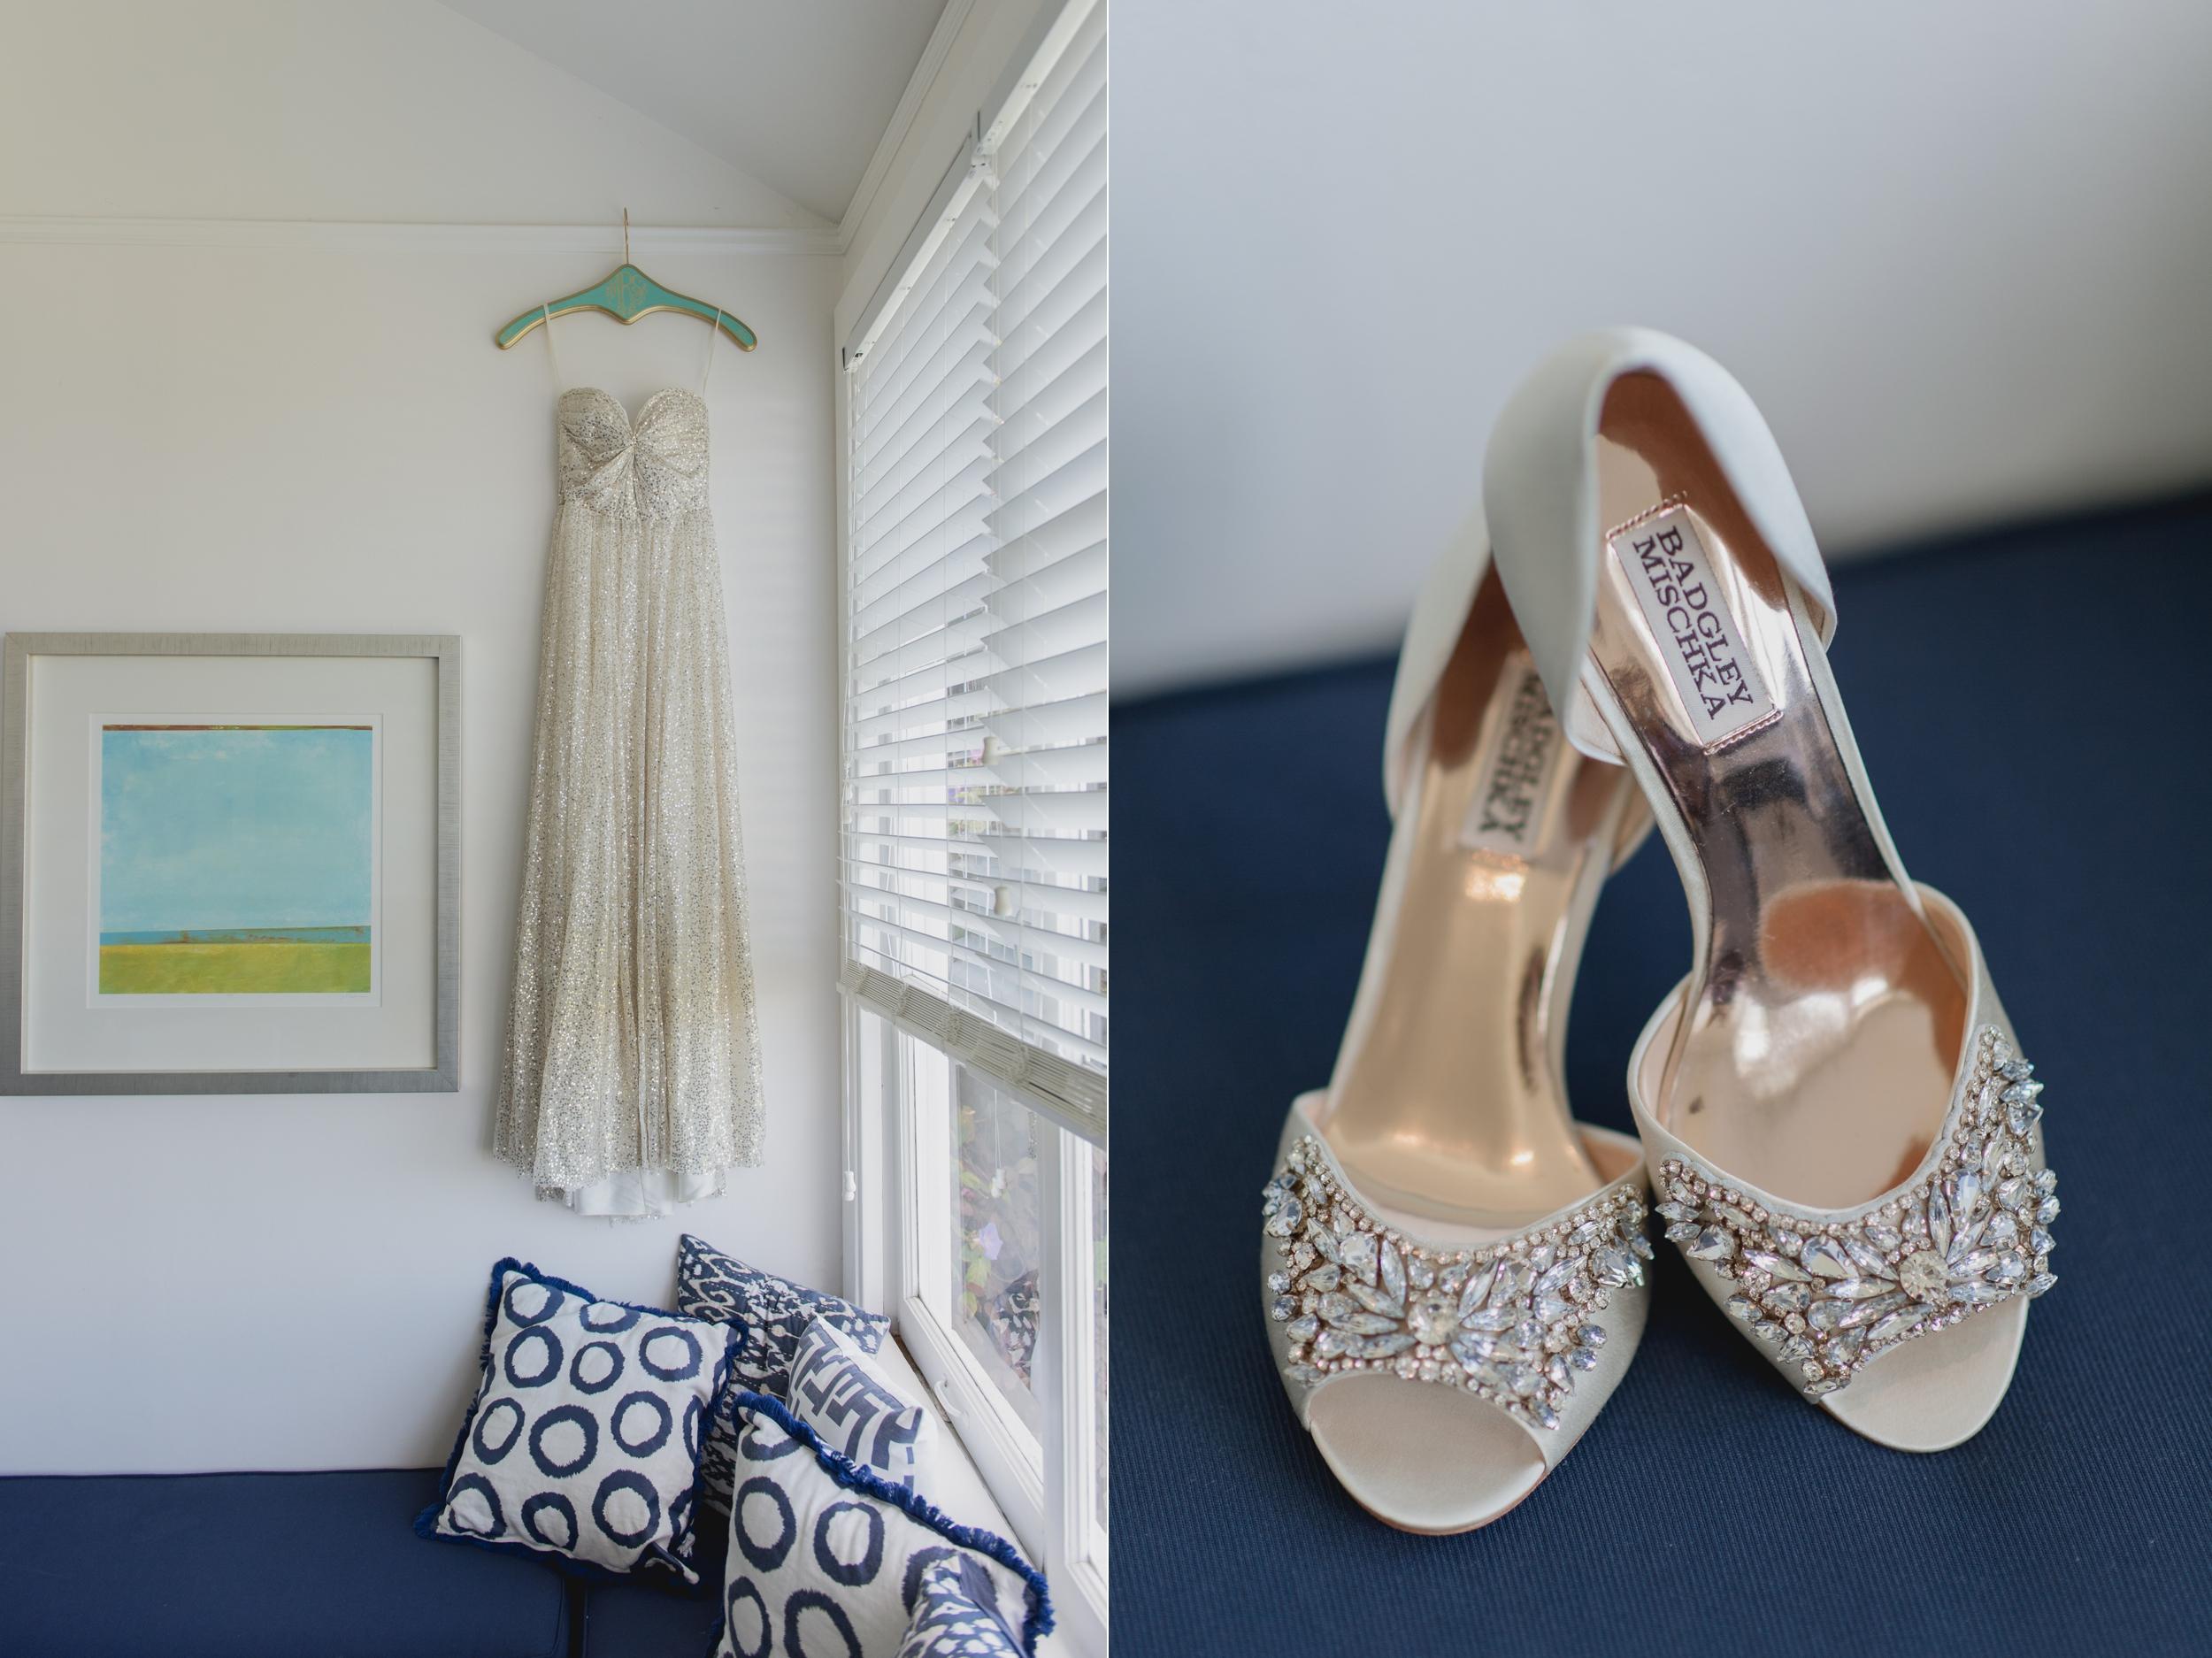 studio-333-sausalito-wedding-photographer-vc02.jpg